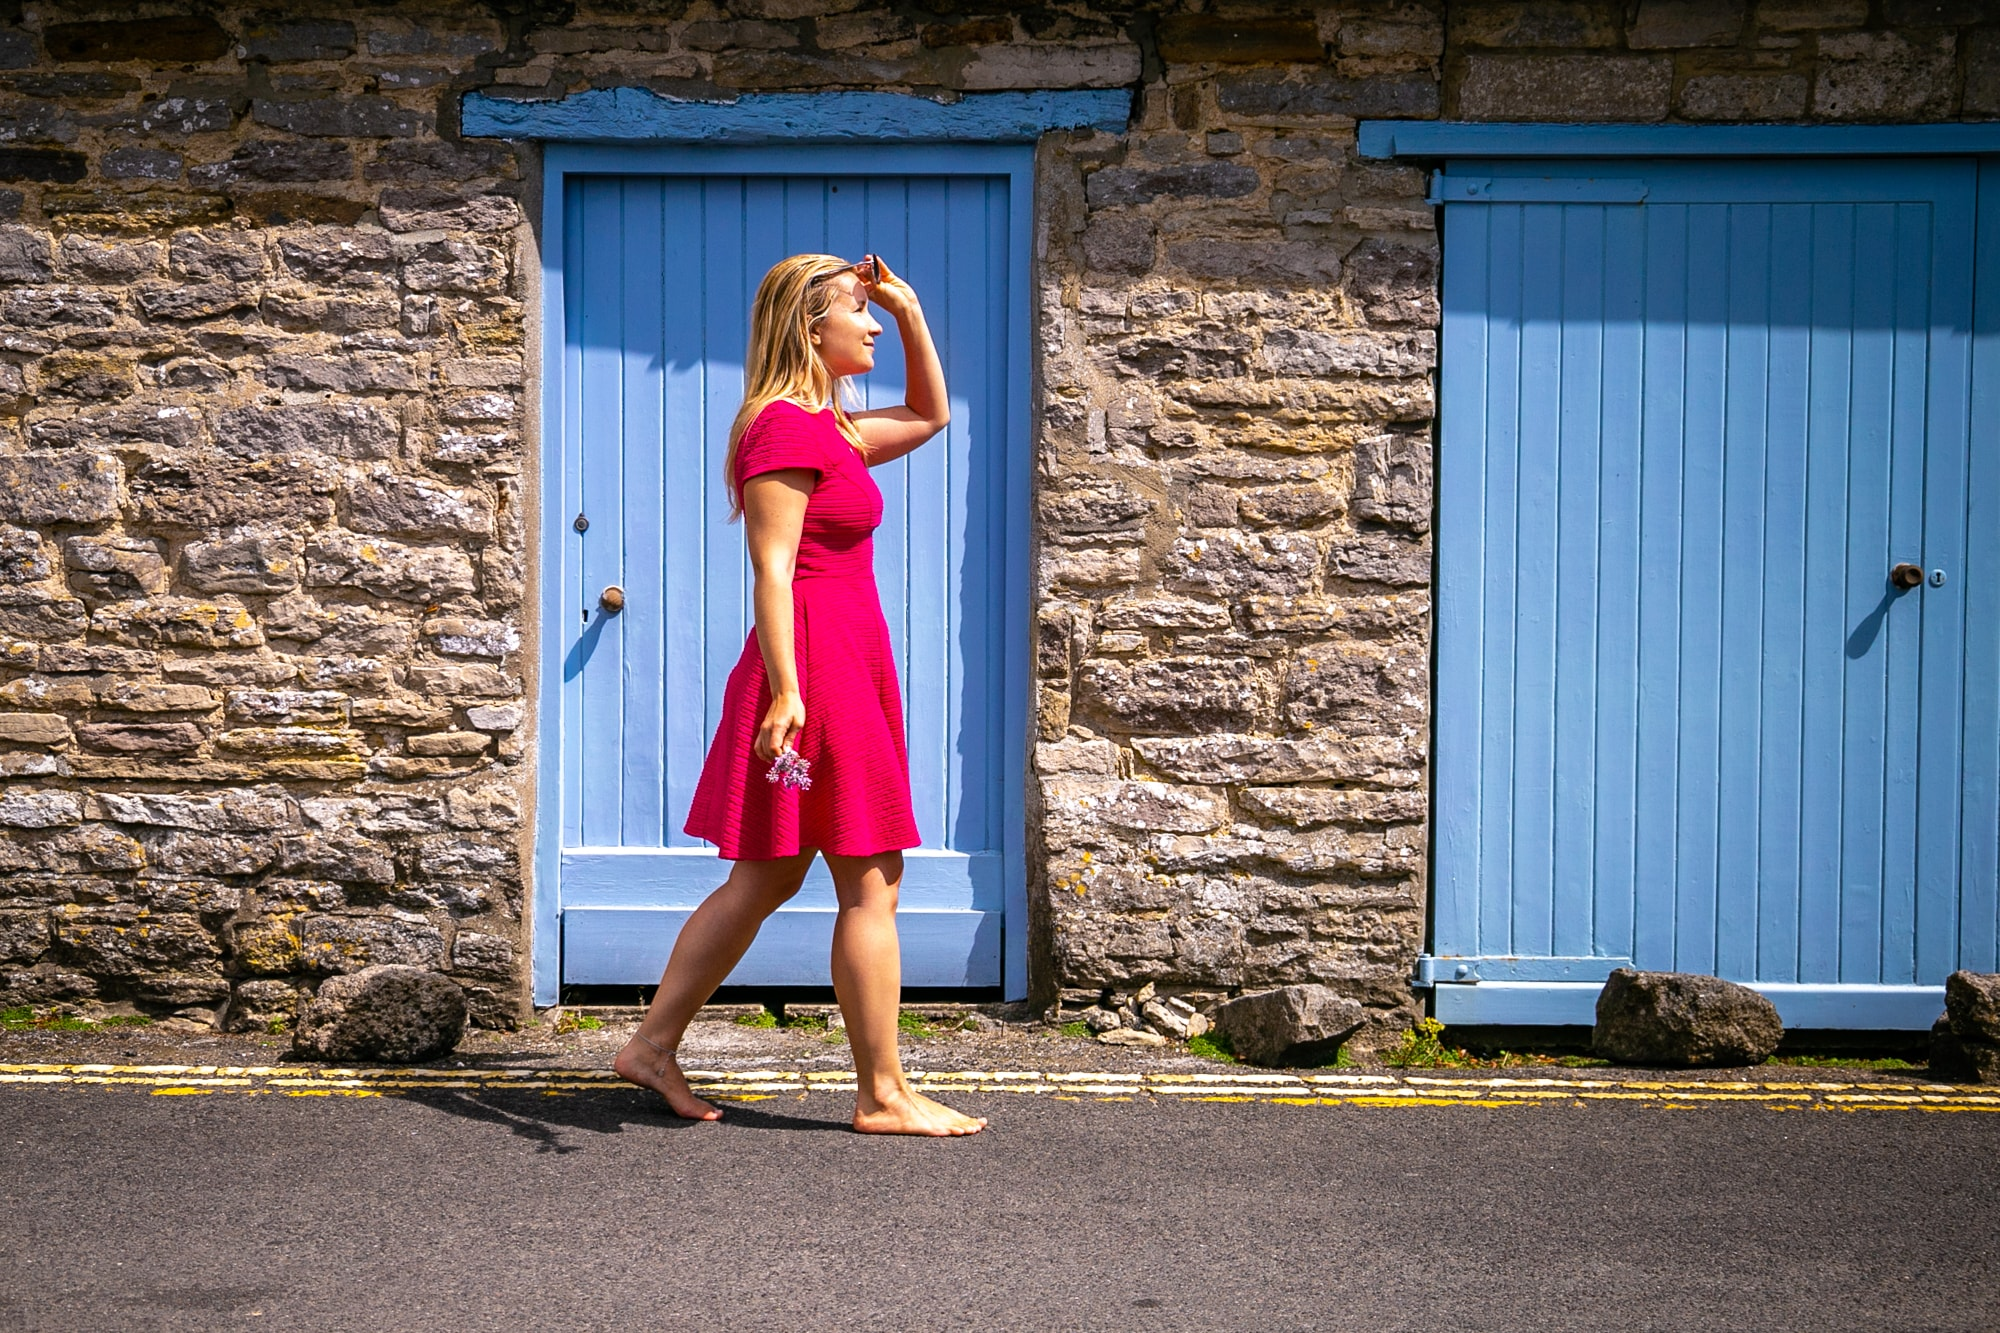 Anya Andreeva walking in pink dress by blue door